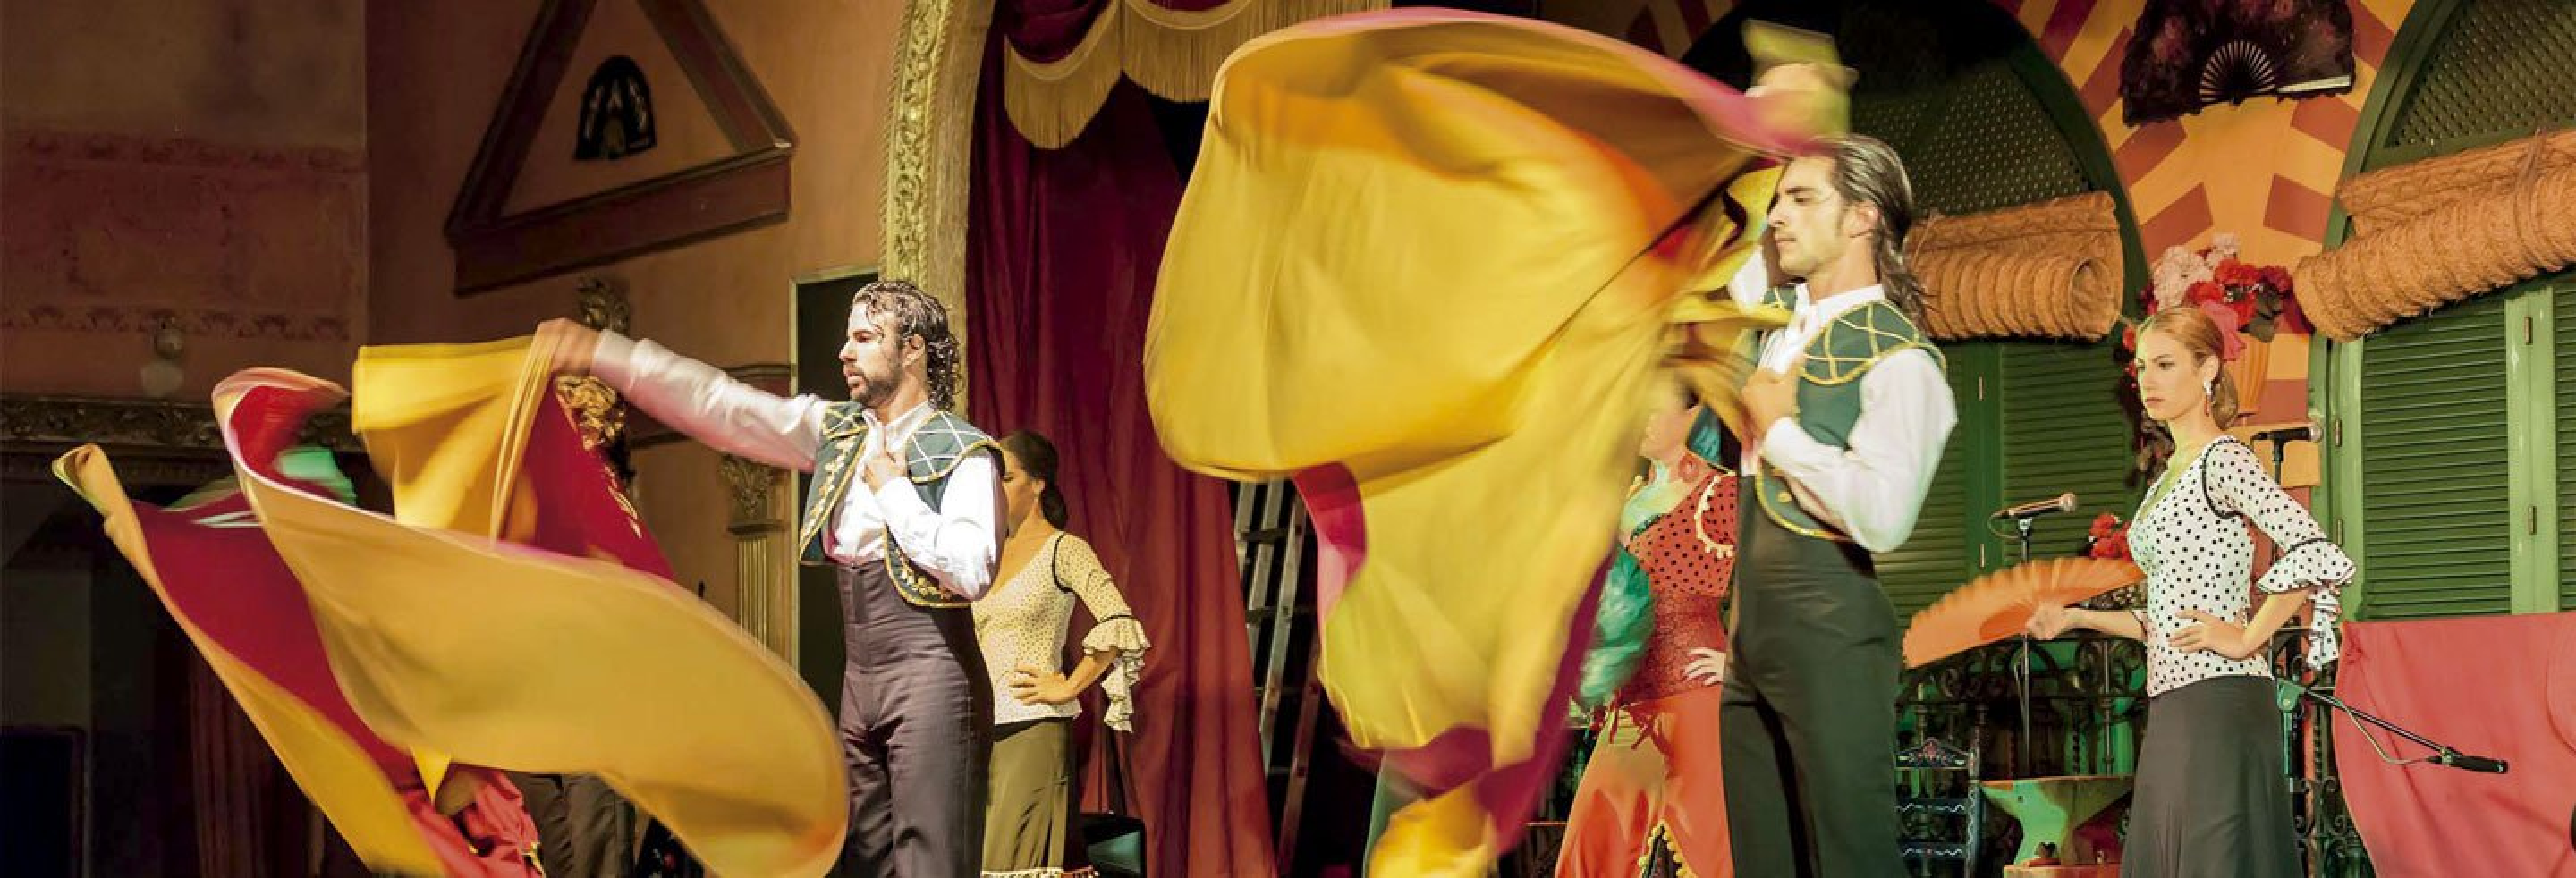 Spectacle de flamenco dans El Palacio Andaluz